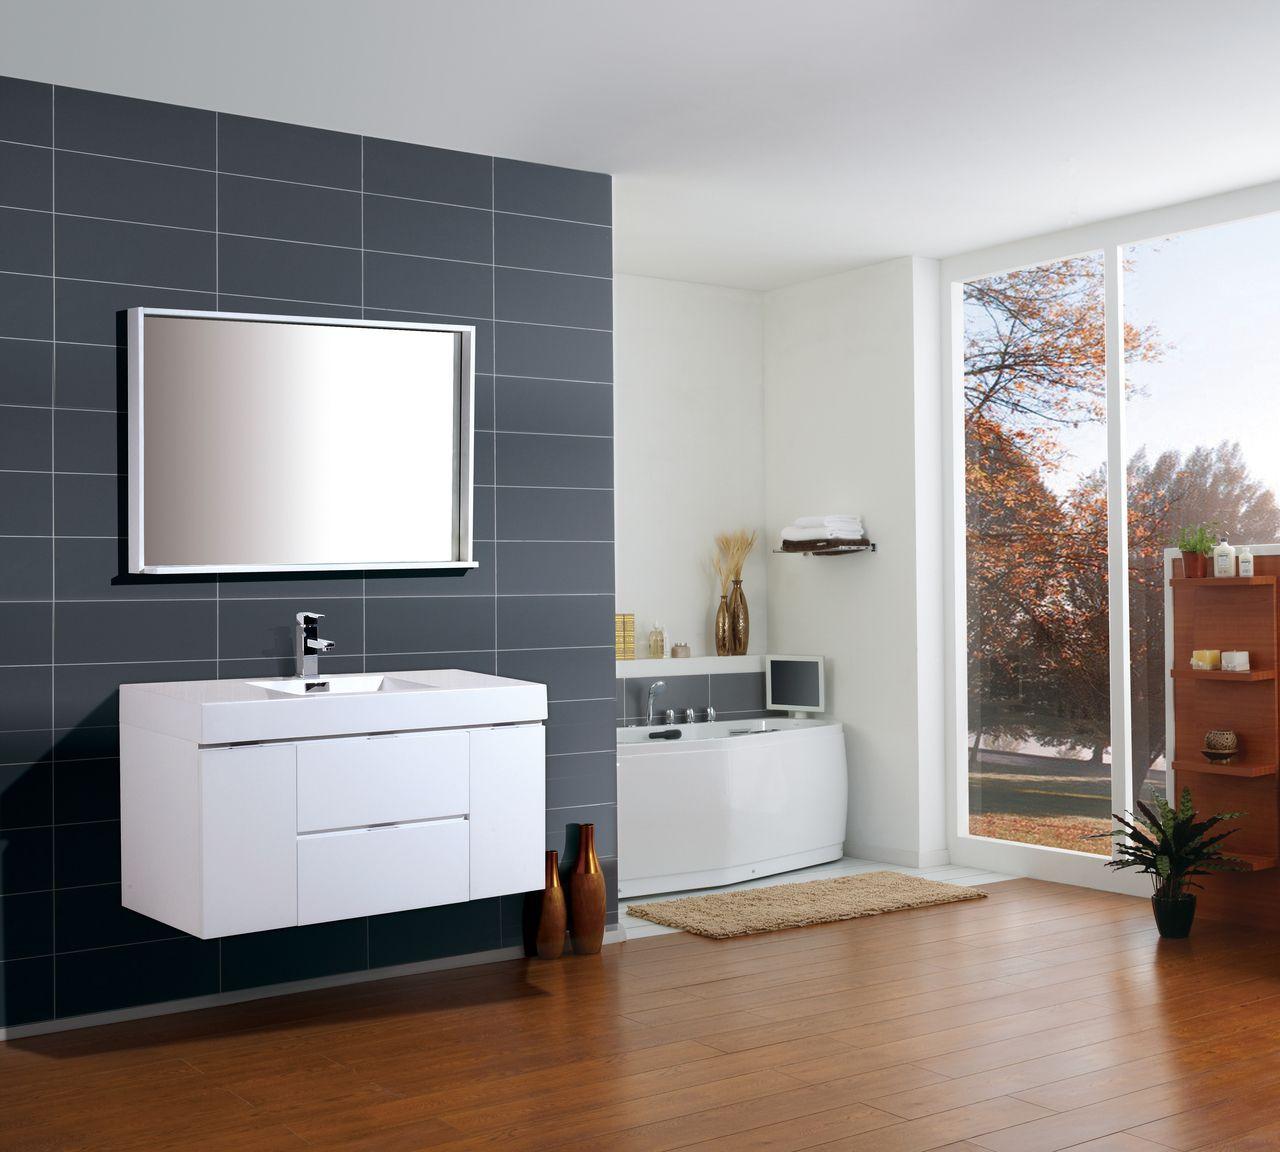 sink vanity yellow bathroom mirror countertop ensemble white nook